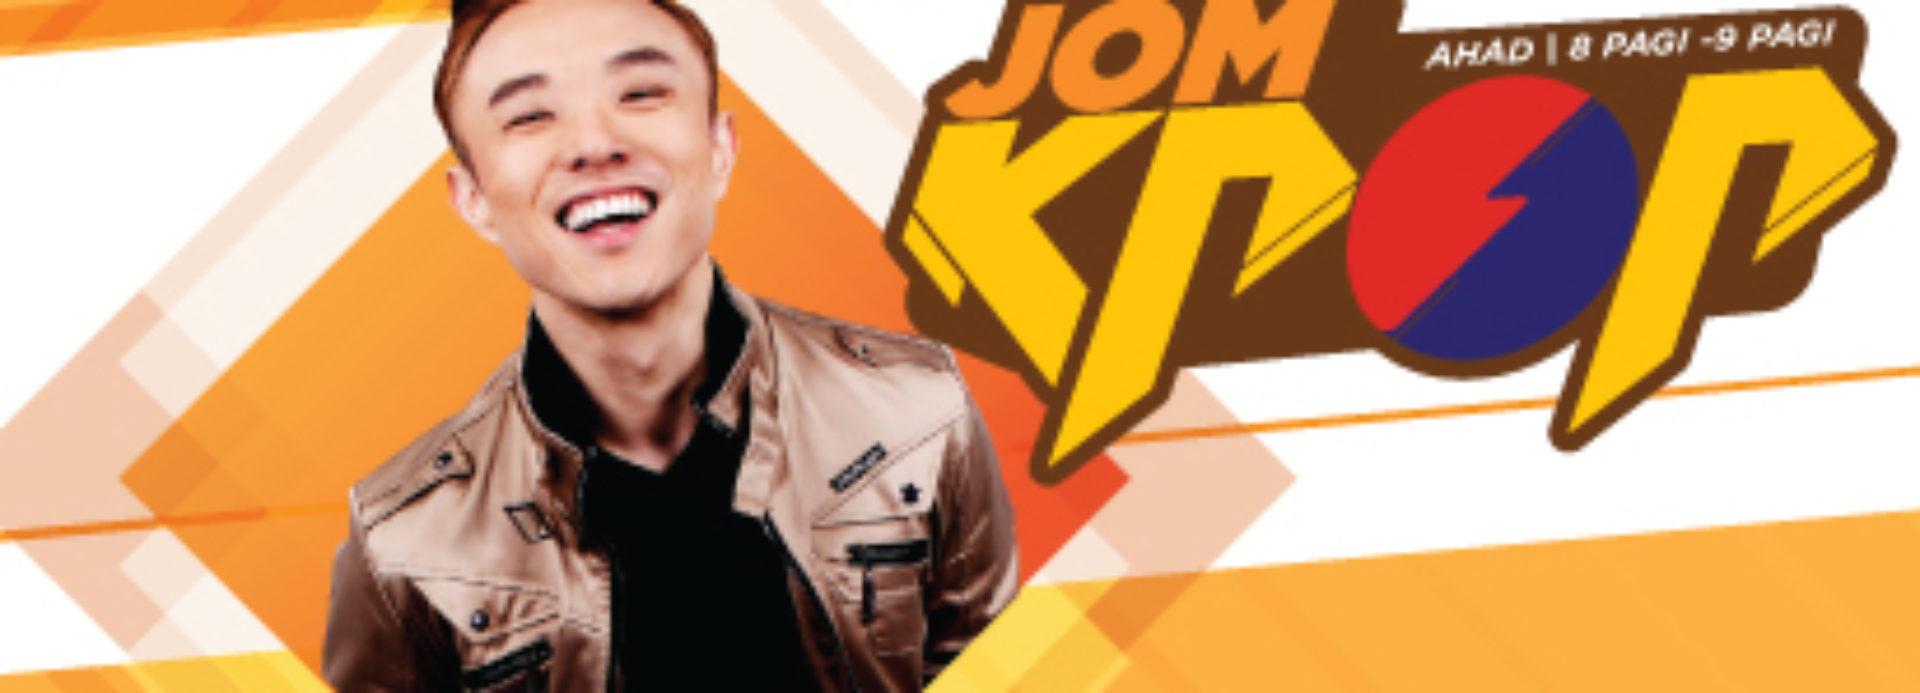 show-landing-page-banner_jom-kpop_412x240px